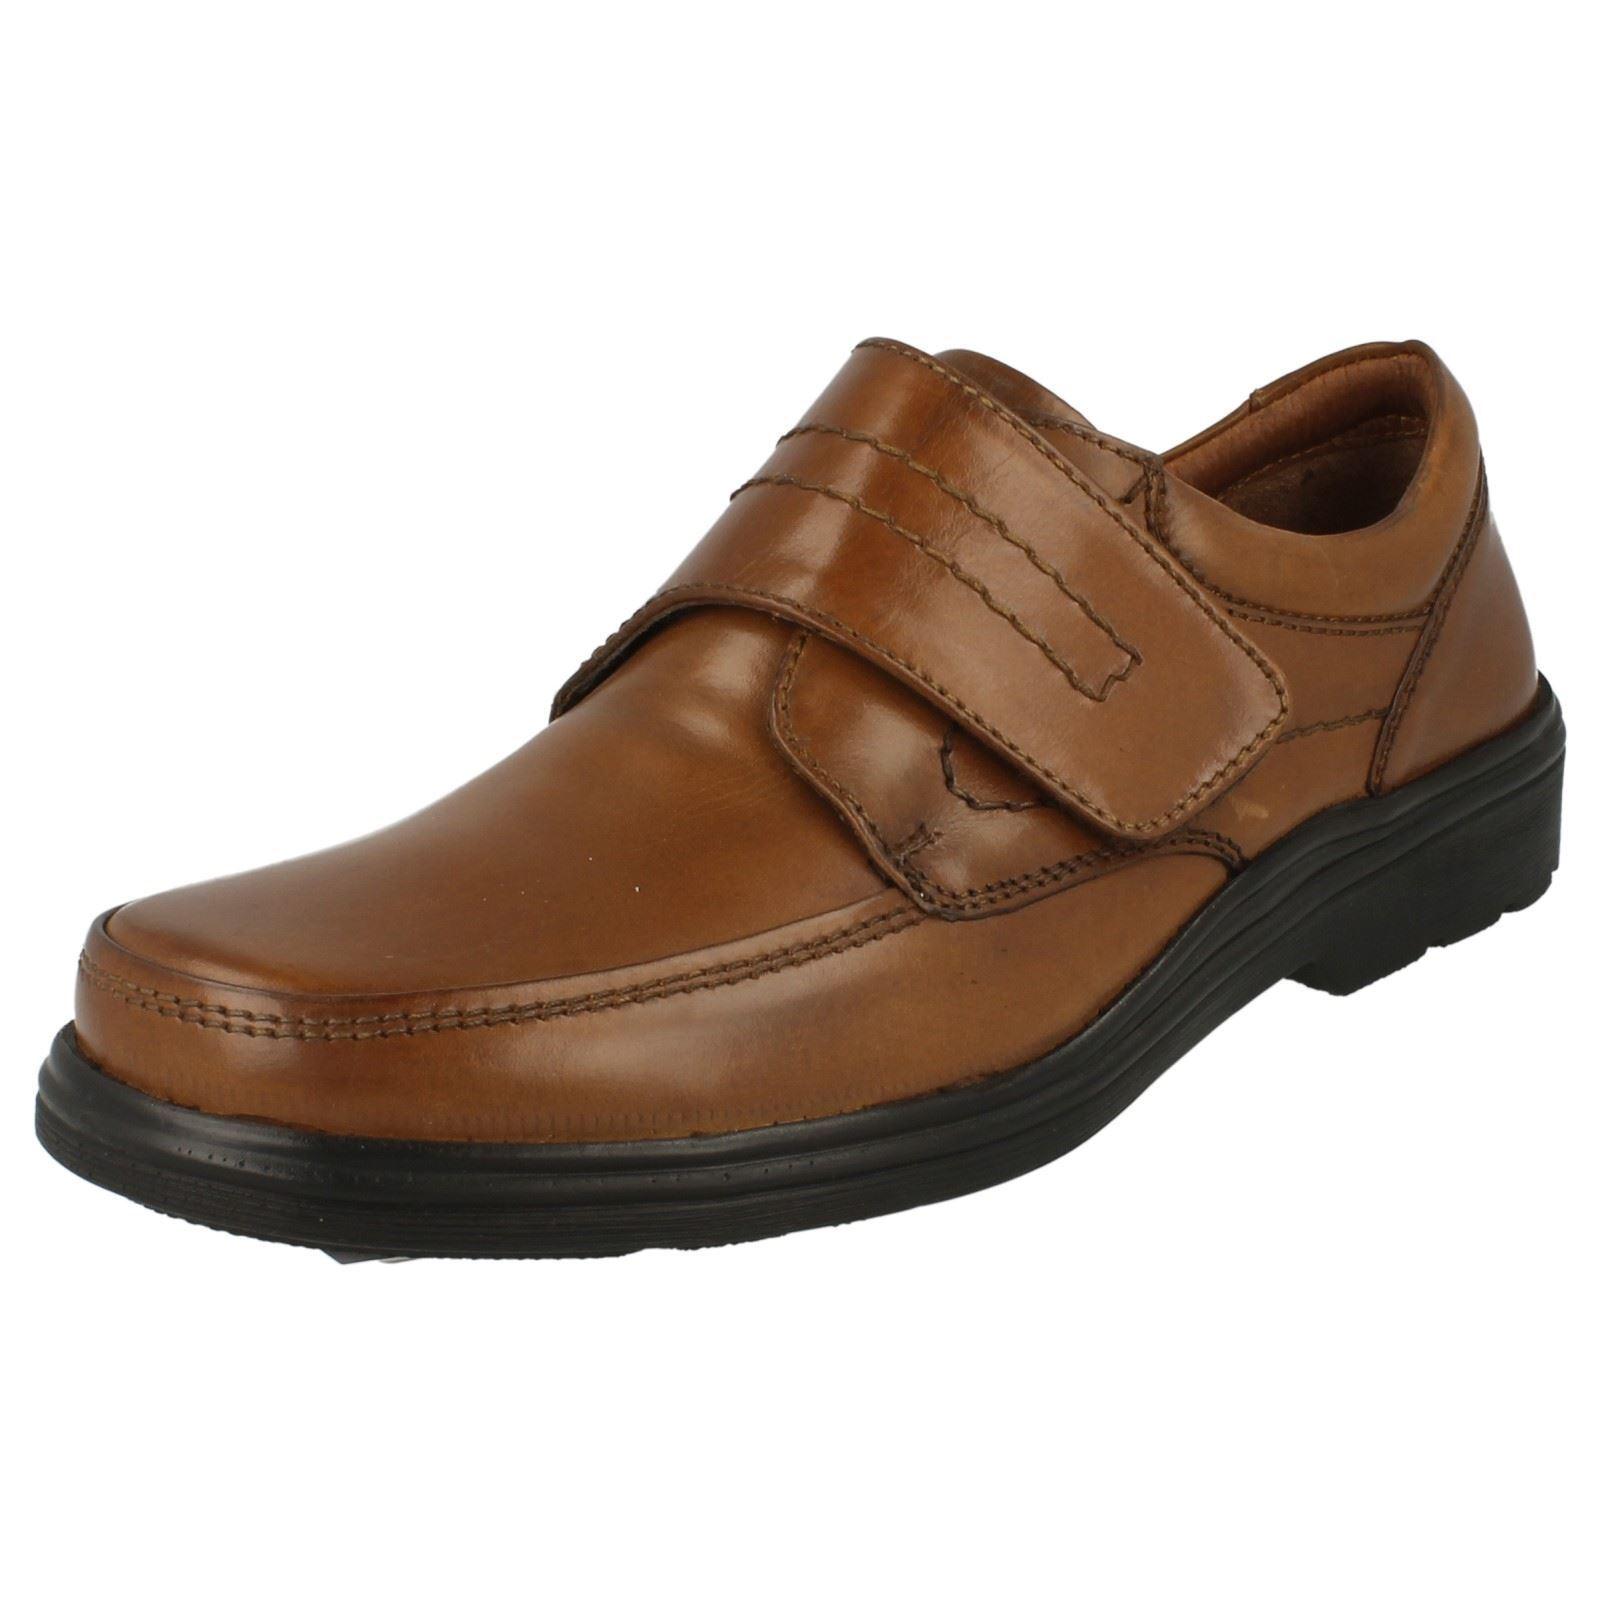 Maverick A1108 Leather Mens Tan Riptape 100% Leather A1108 Shoes c6a648